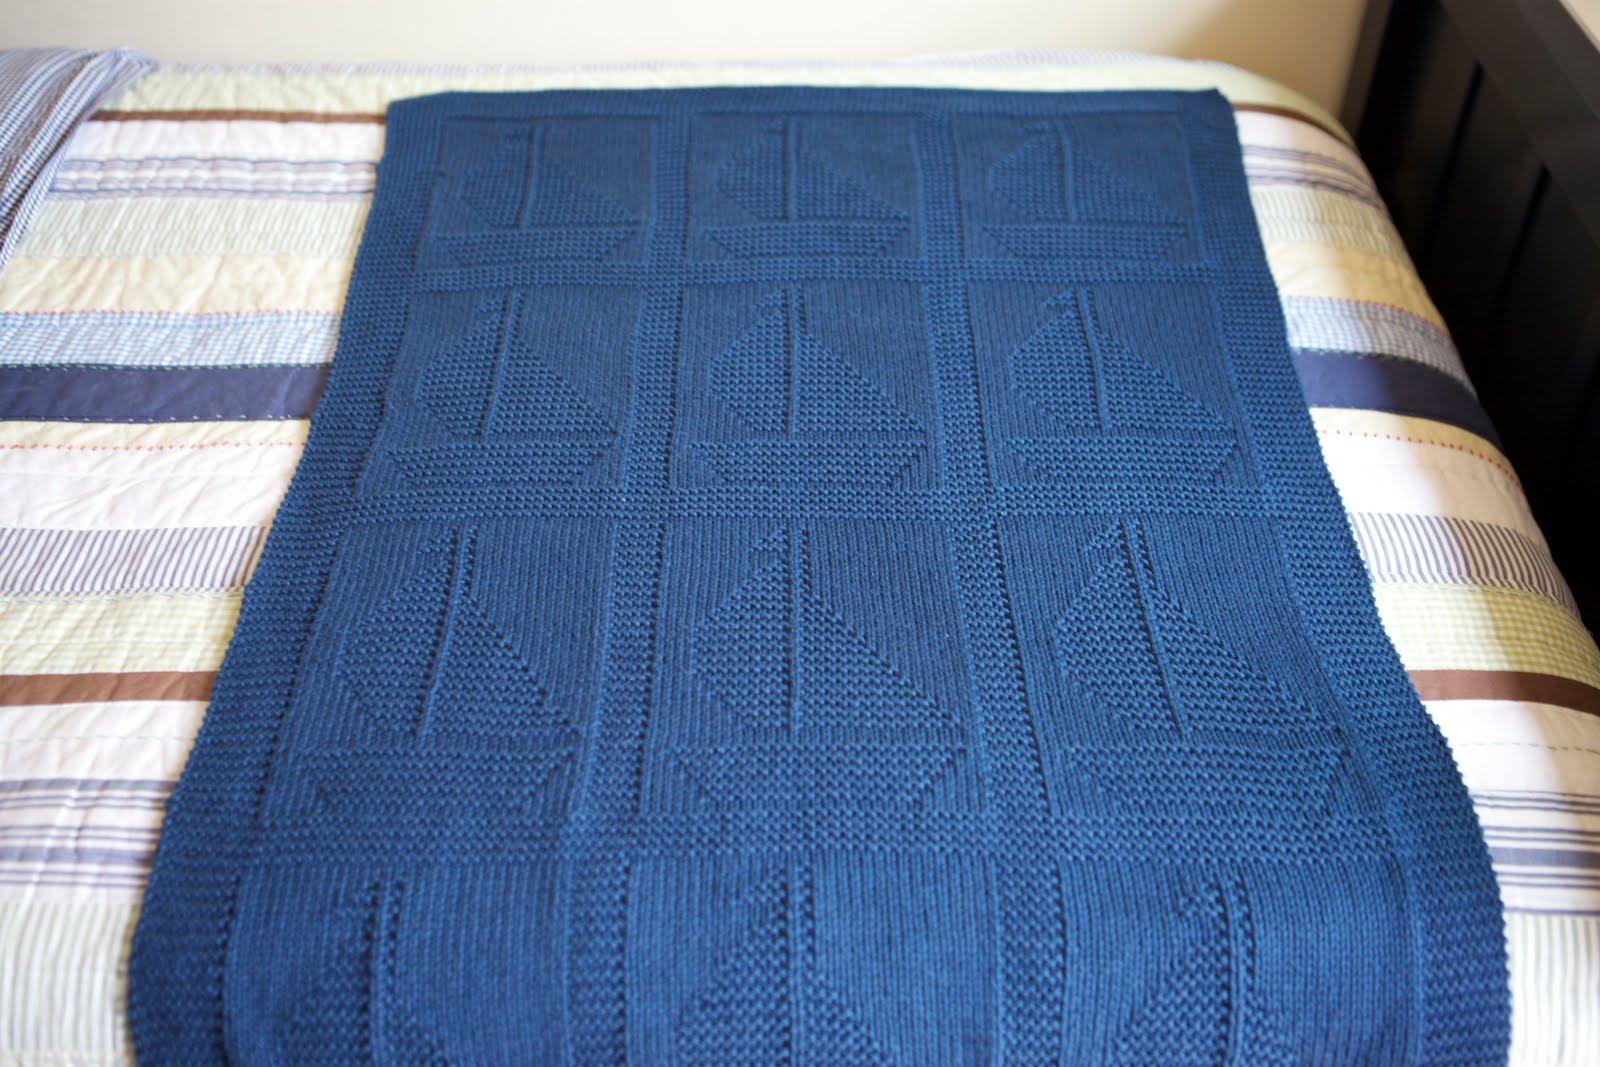 Sailboat Knitting Pattern Baby Blanket : Posh Knits: F.O.: Sail Away Blanket